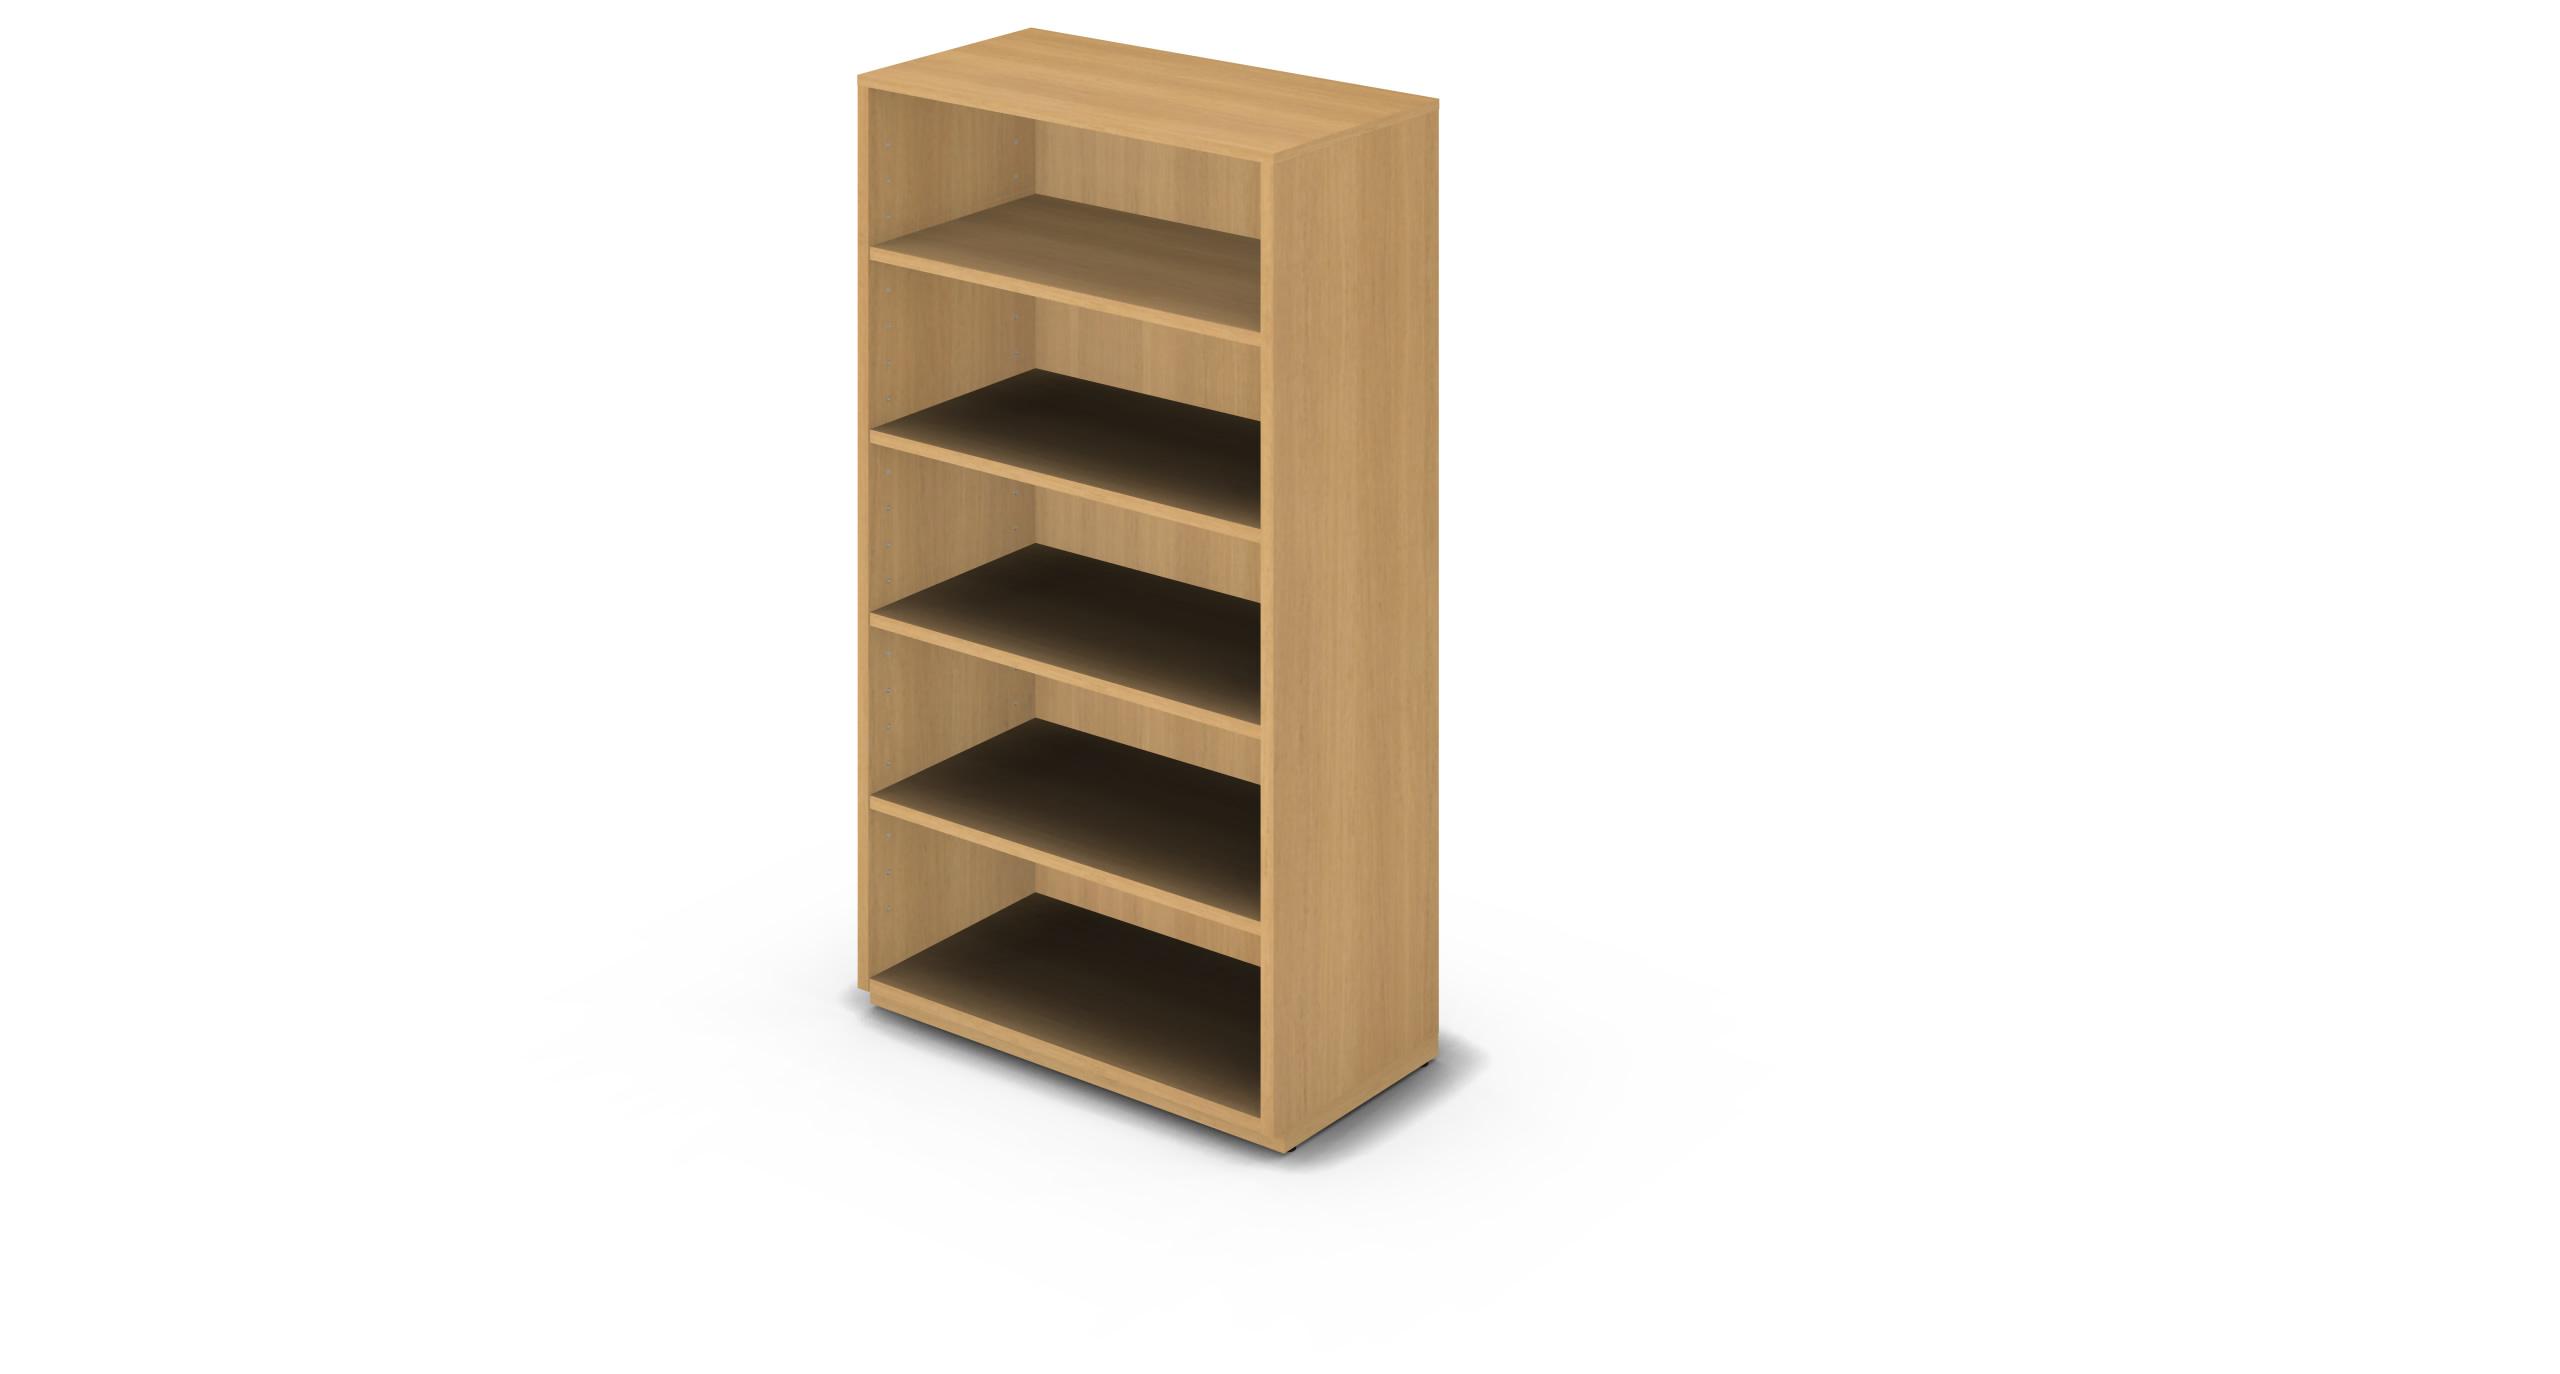 Shelf_900x450x1800_Oak